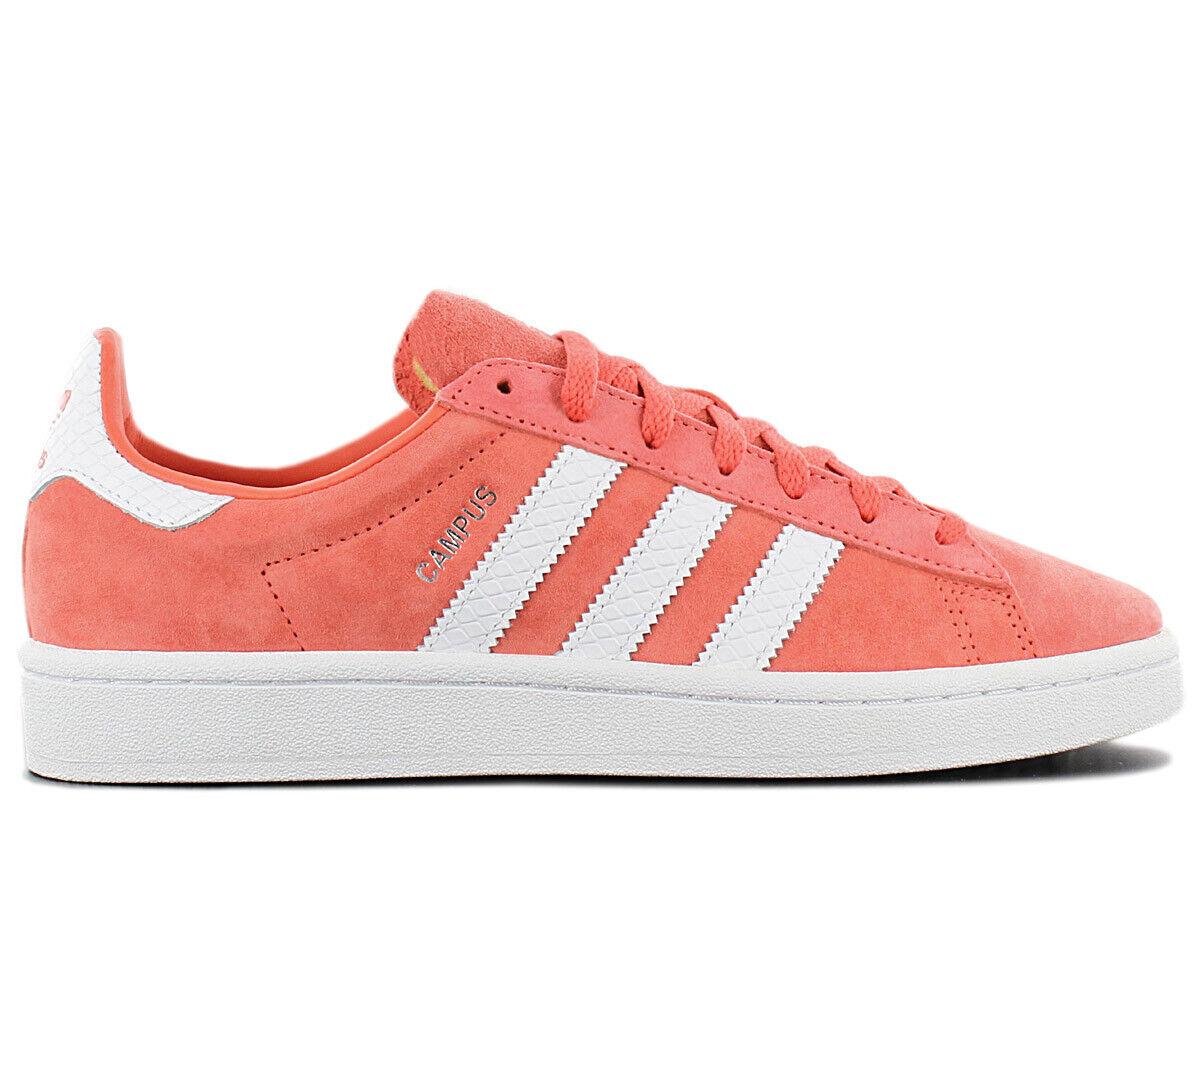 Adidas Originals Campus W Damen Turnschuhe CQ2099 Retro Schuhe Turnschuh Sportschuh